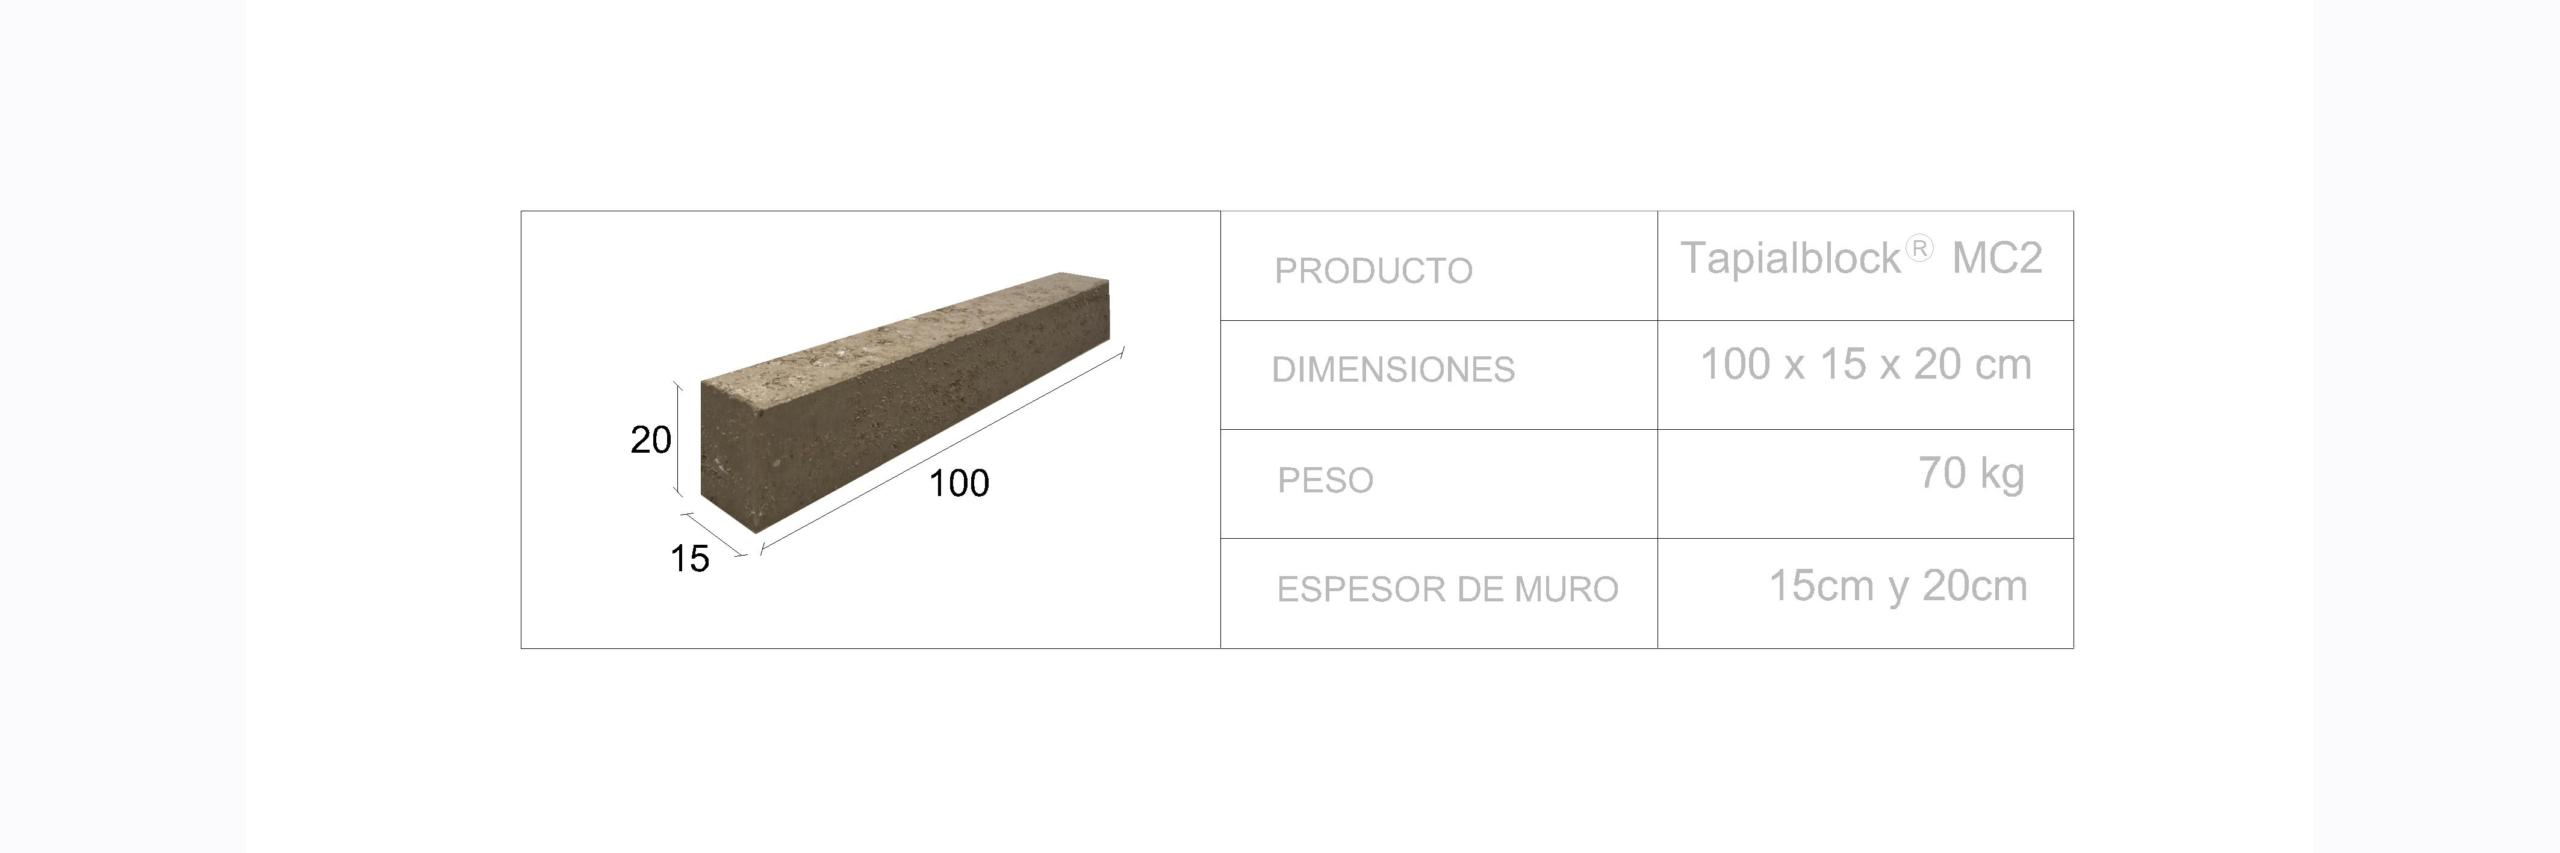 Tapialblock® MC2 - Fetdeterra